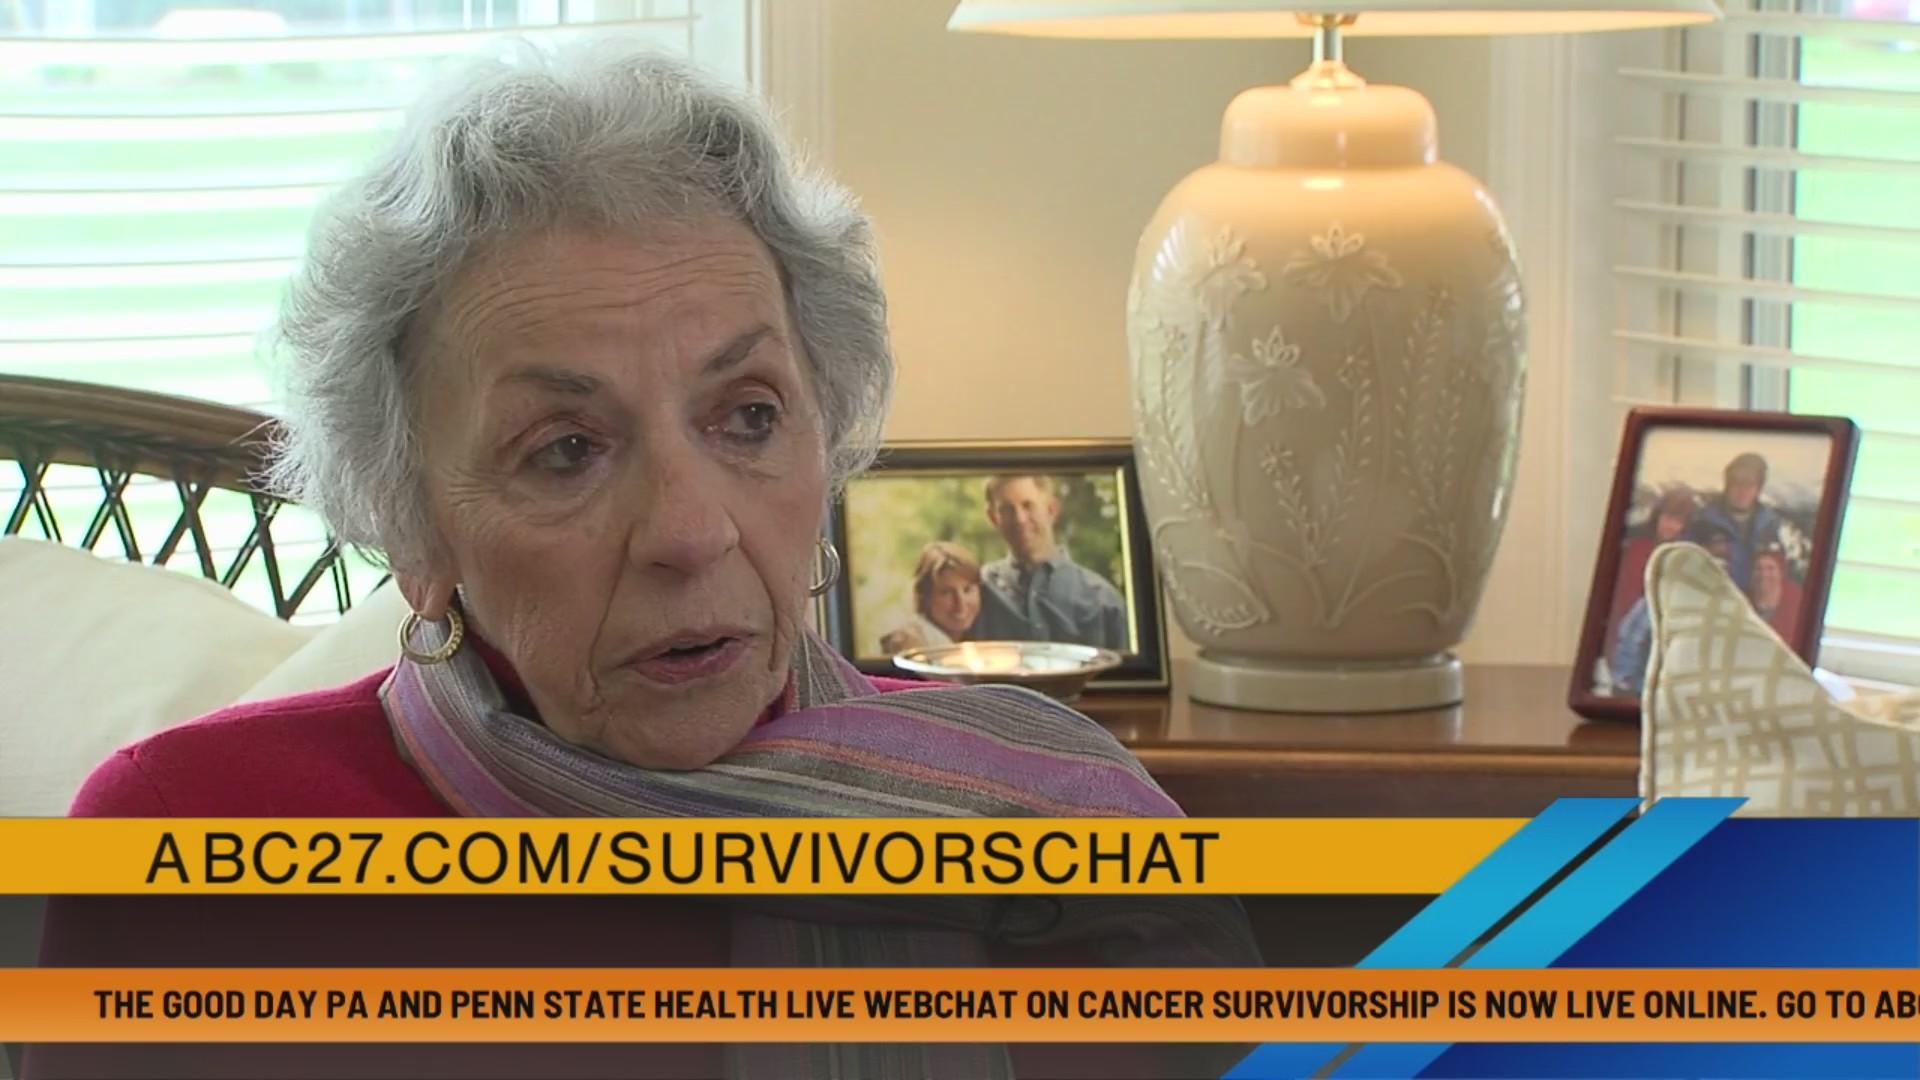 Penn State Health: Cancer Survivorship